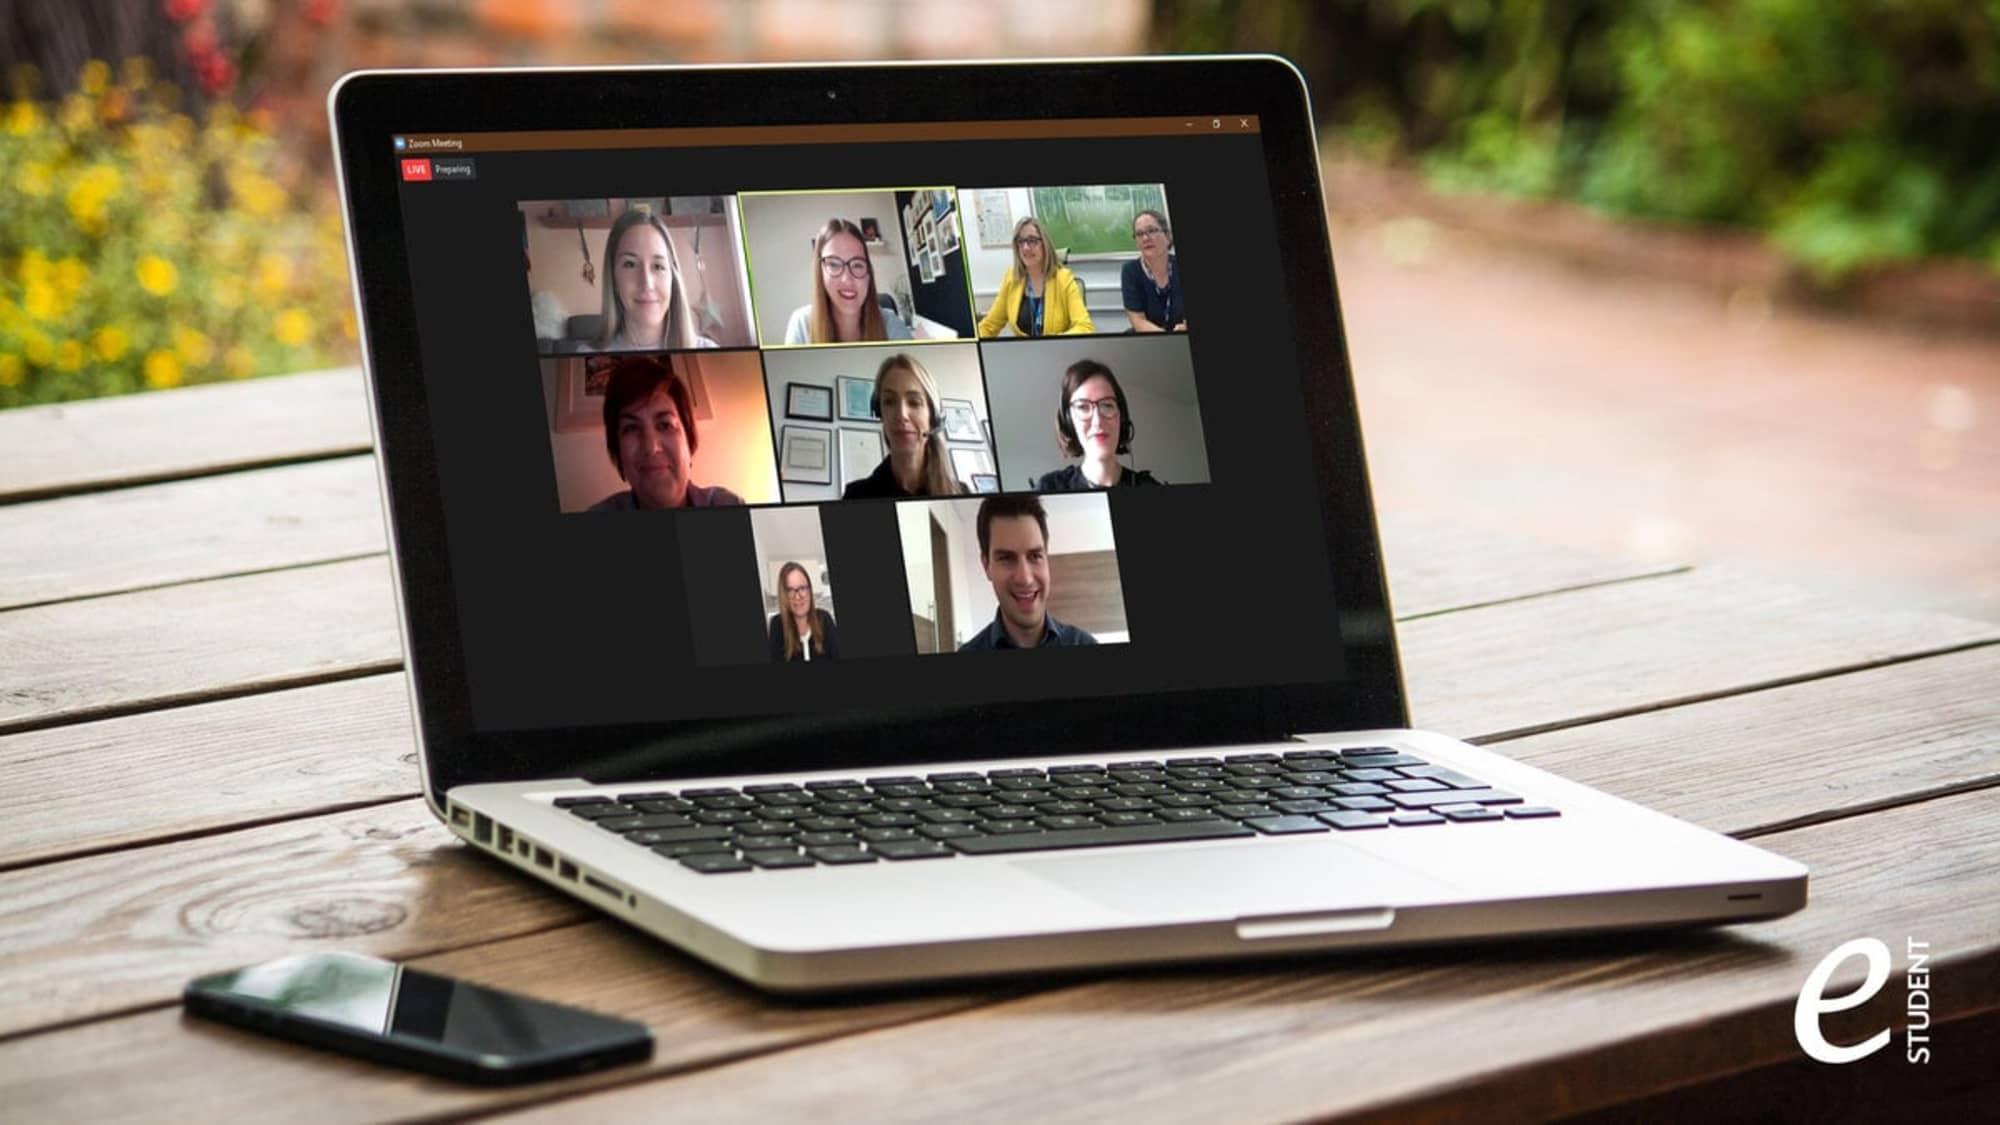 eSTUDENT webinar -  Društveno odgovorno poslovanje za bolje sutra